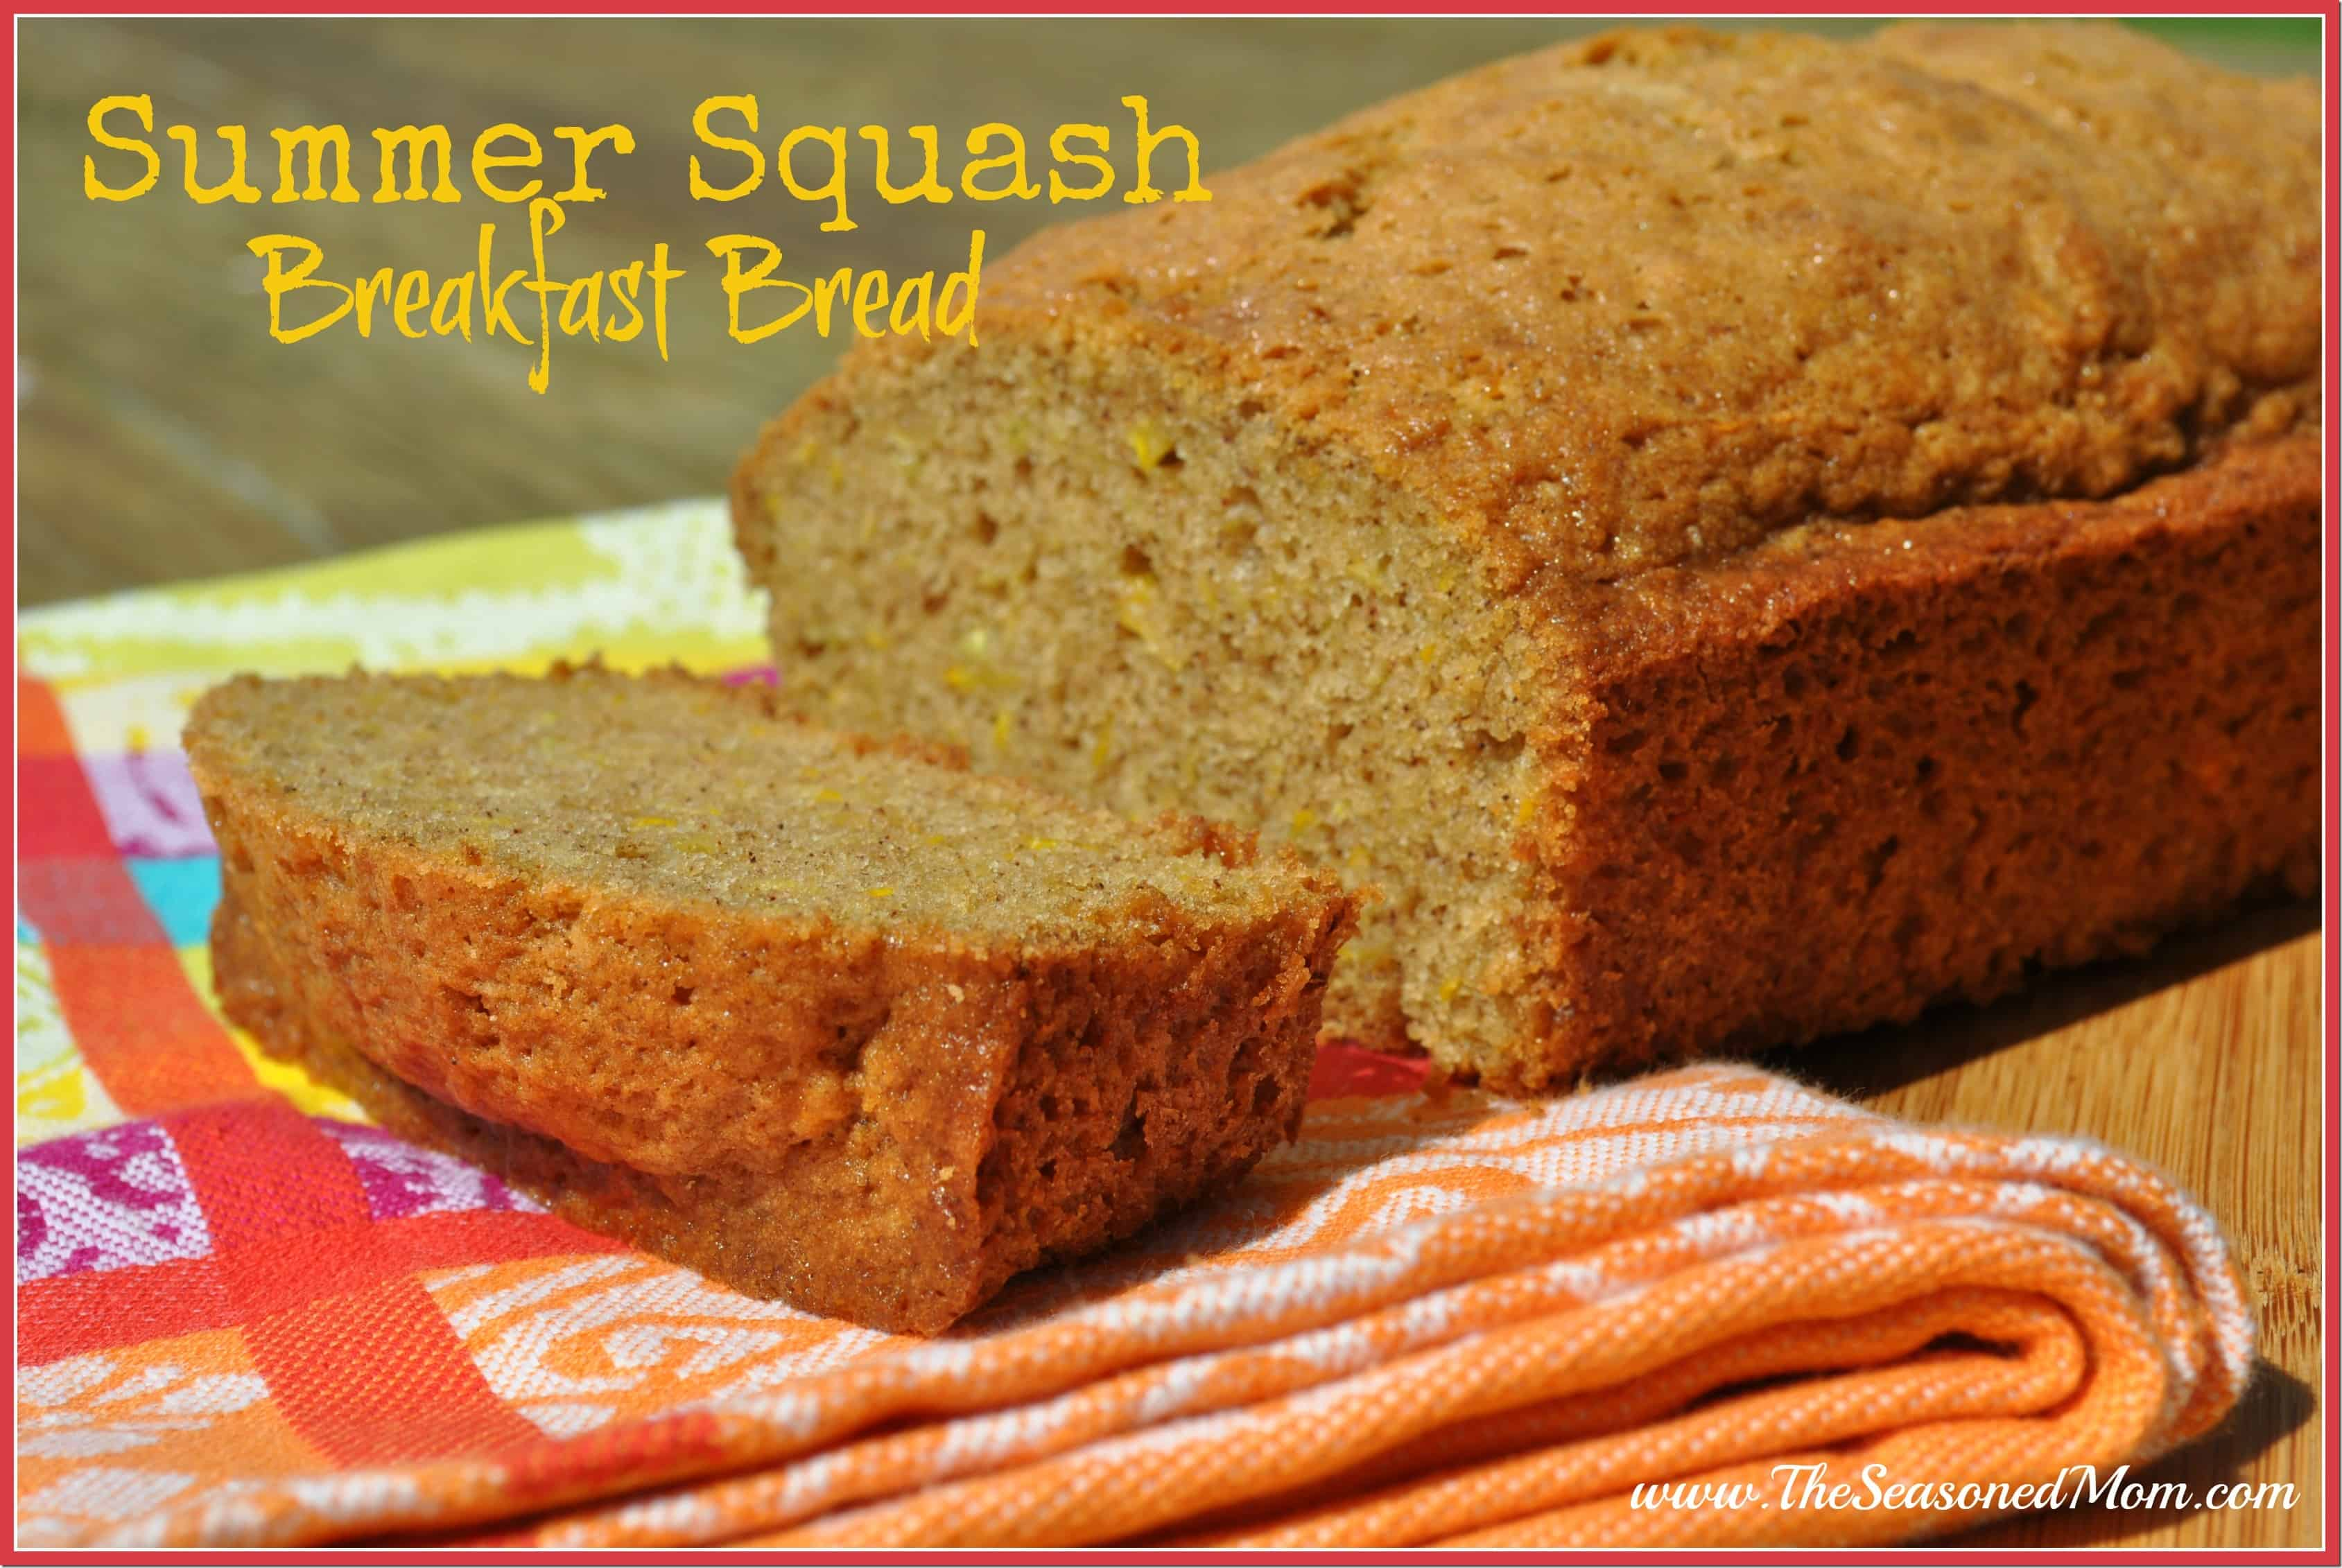 Summer Squash Breakfast Bread - The Seasoned Mom